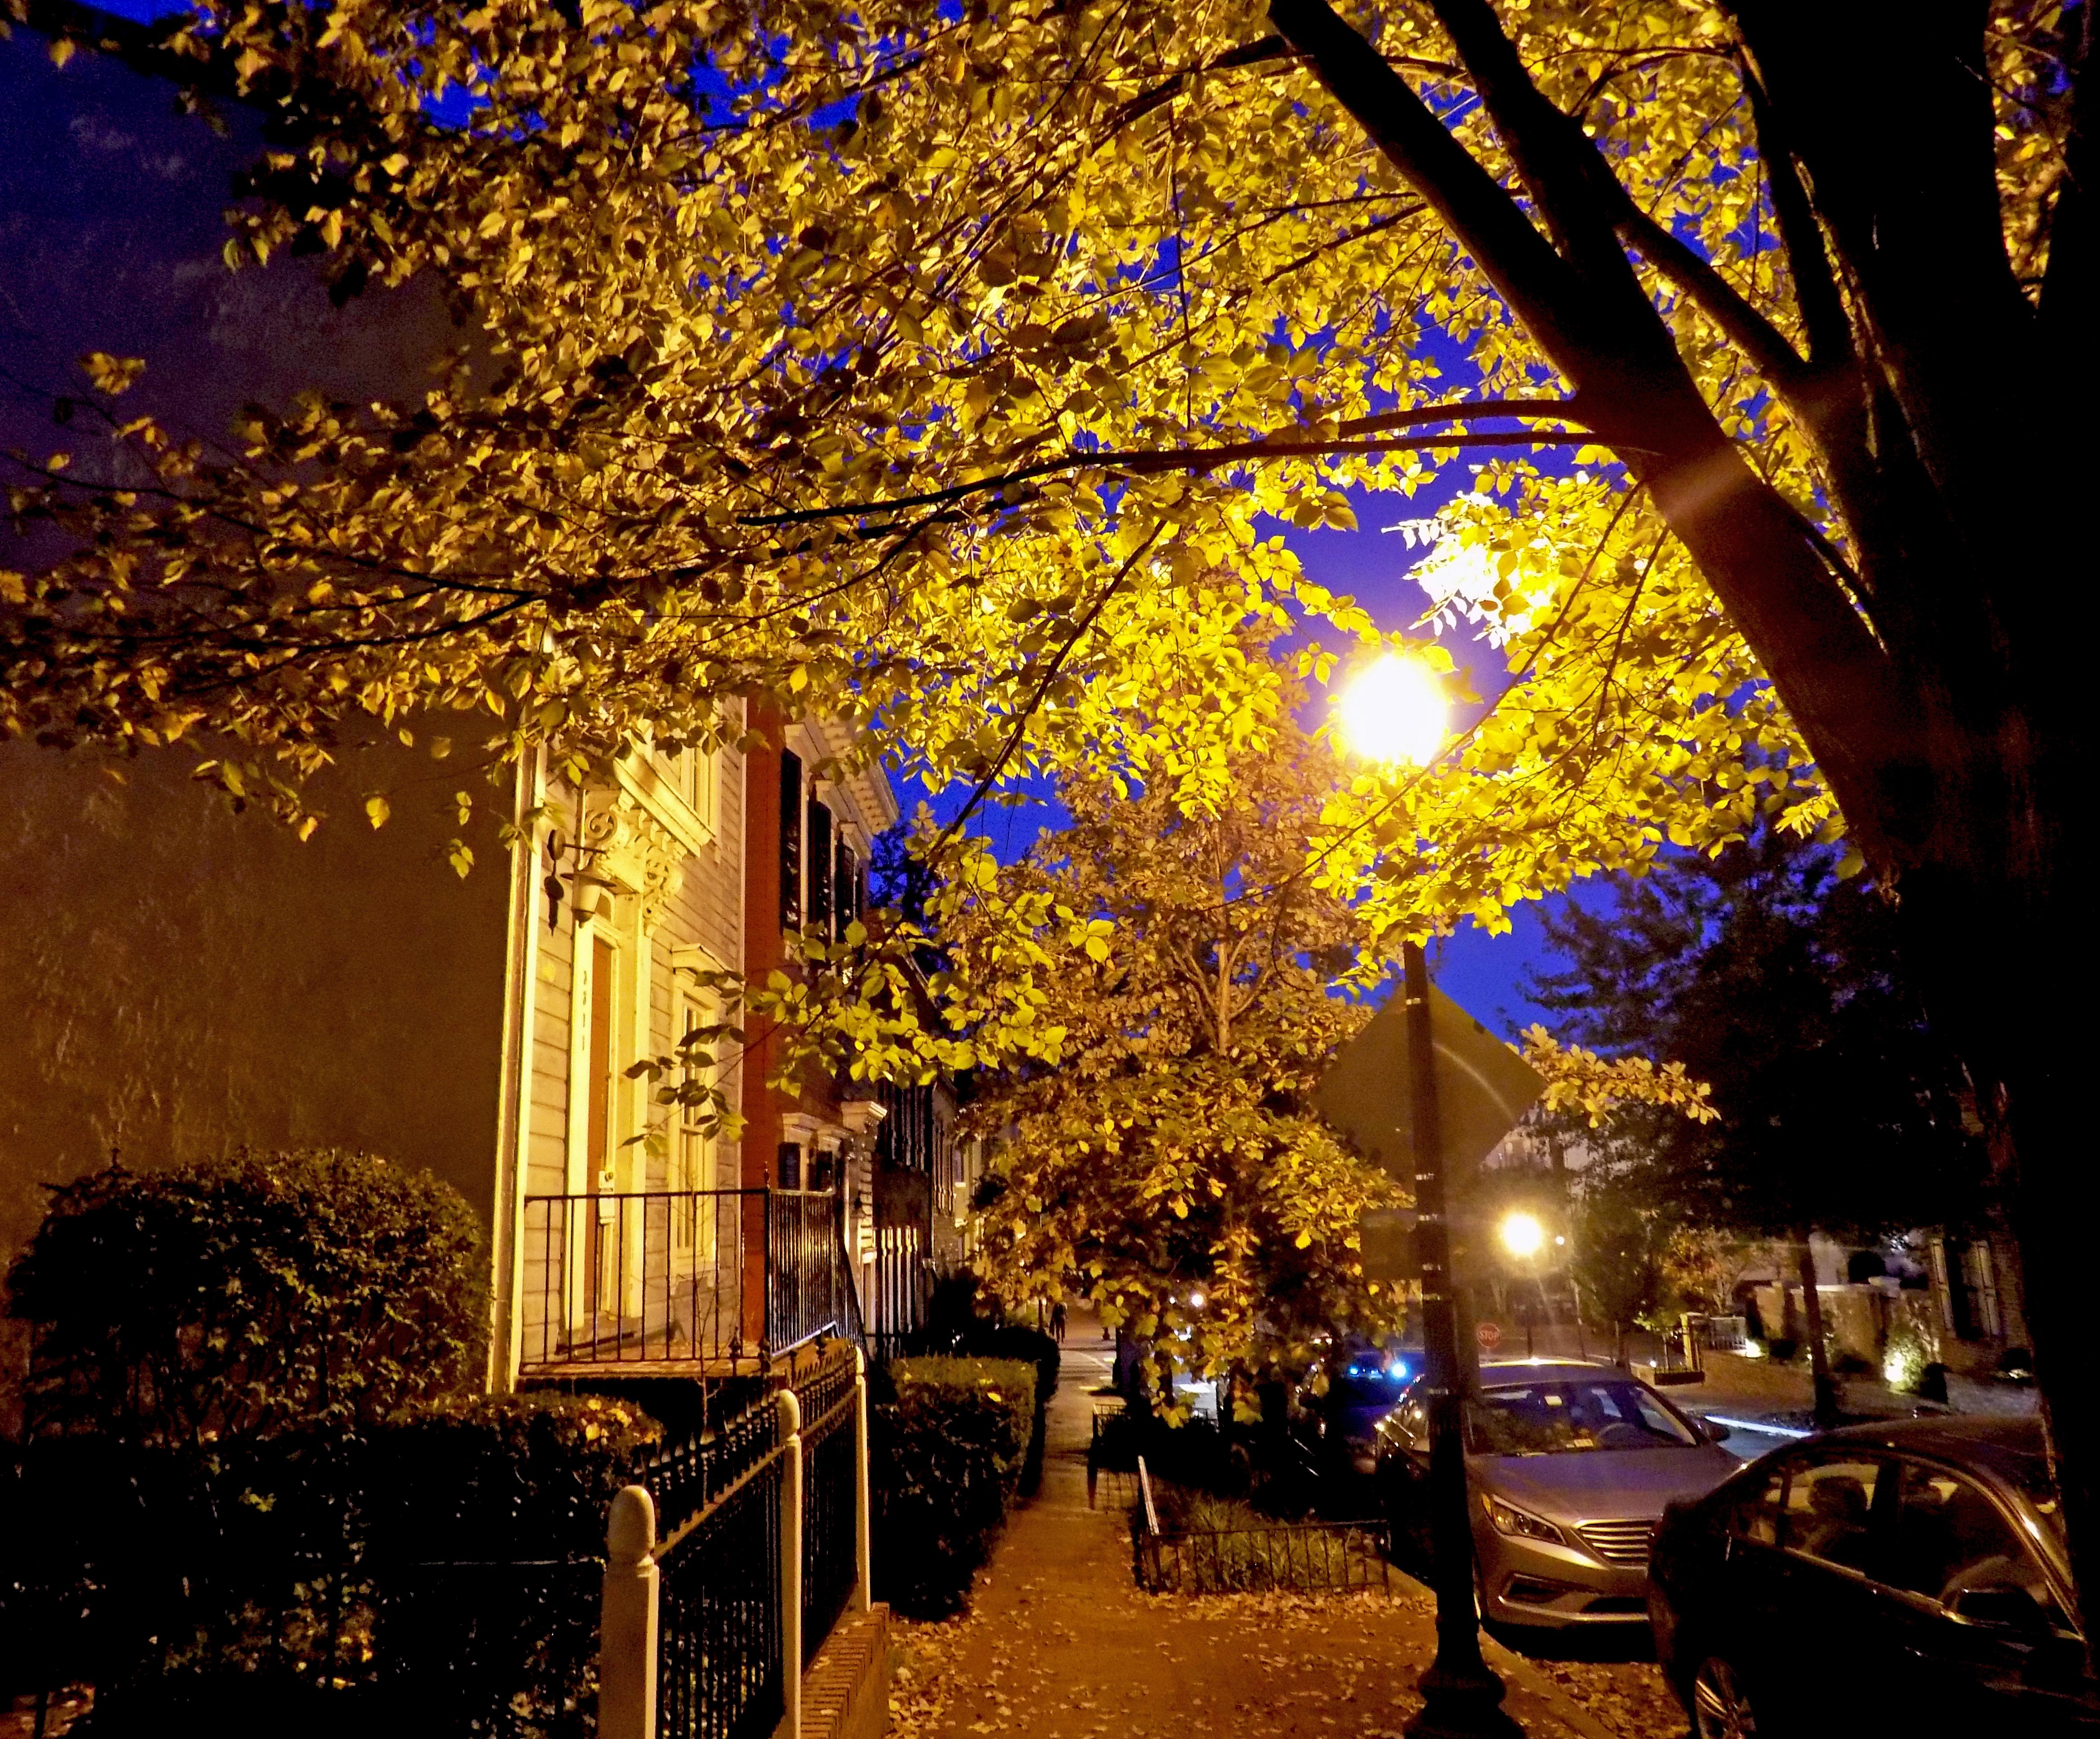 Night Fall Street, Autumn, Car, Fall, Leaves, HQ Photo